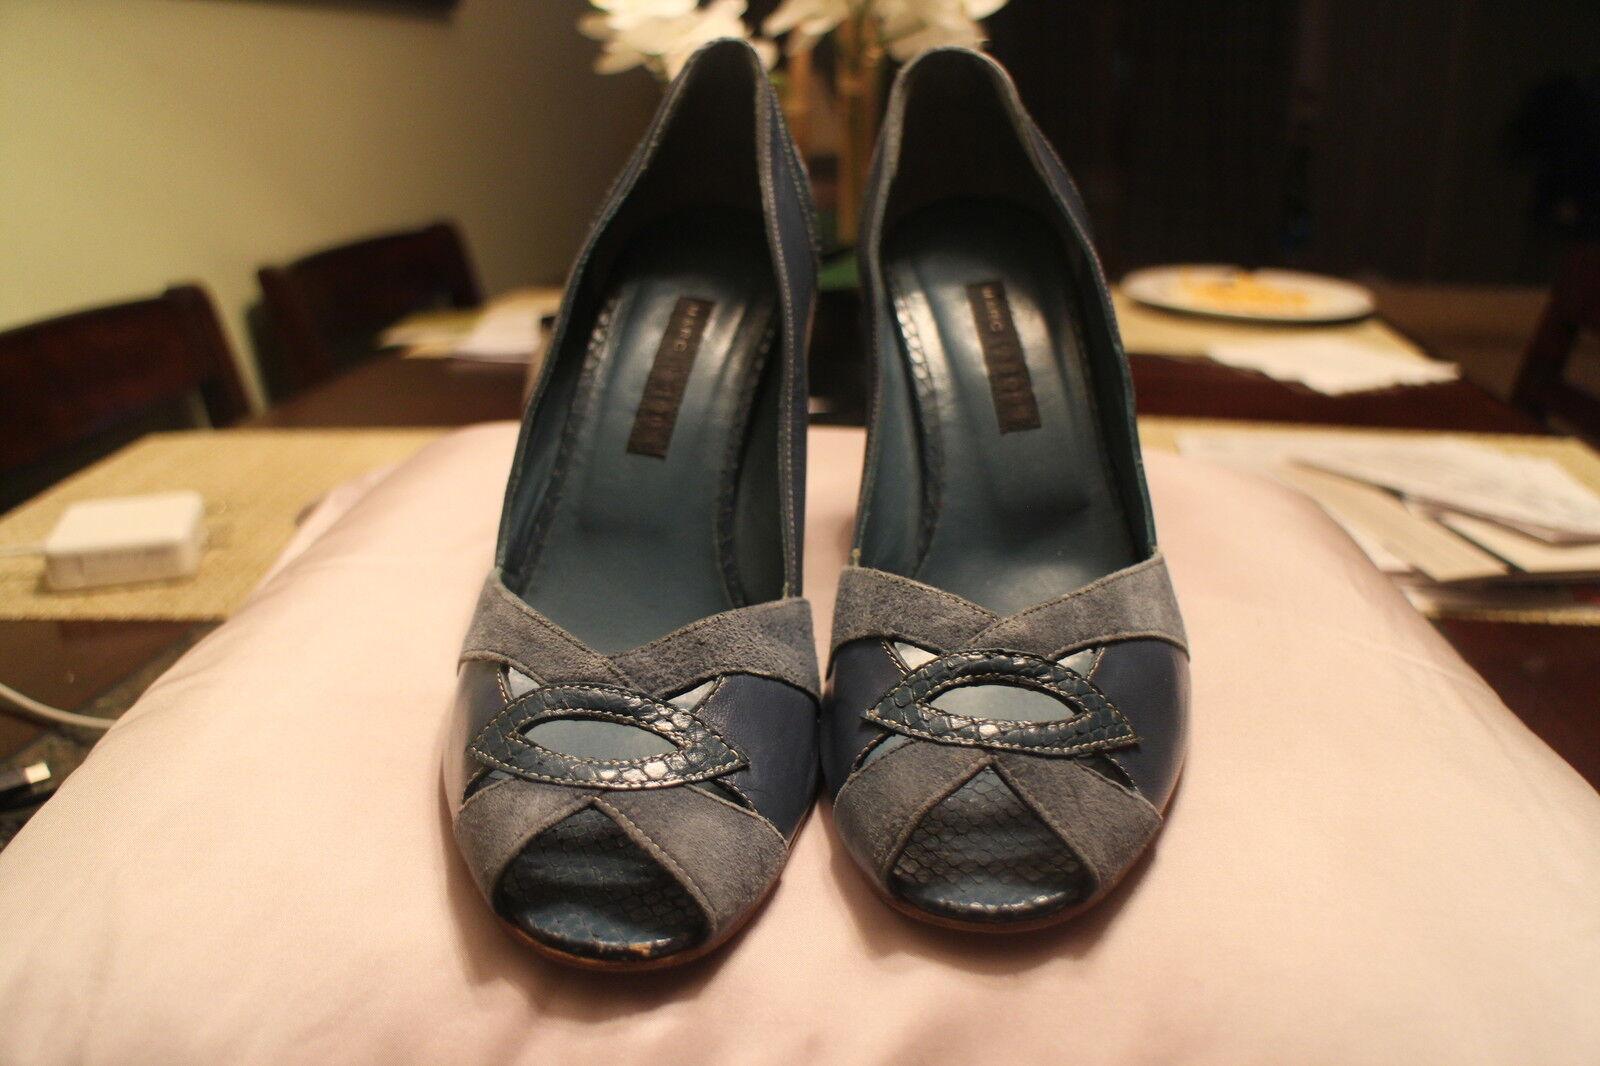 MARC JACOBS bluee Leather Suede Platform Heels Open Toe Size 7 1 2